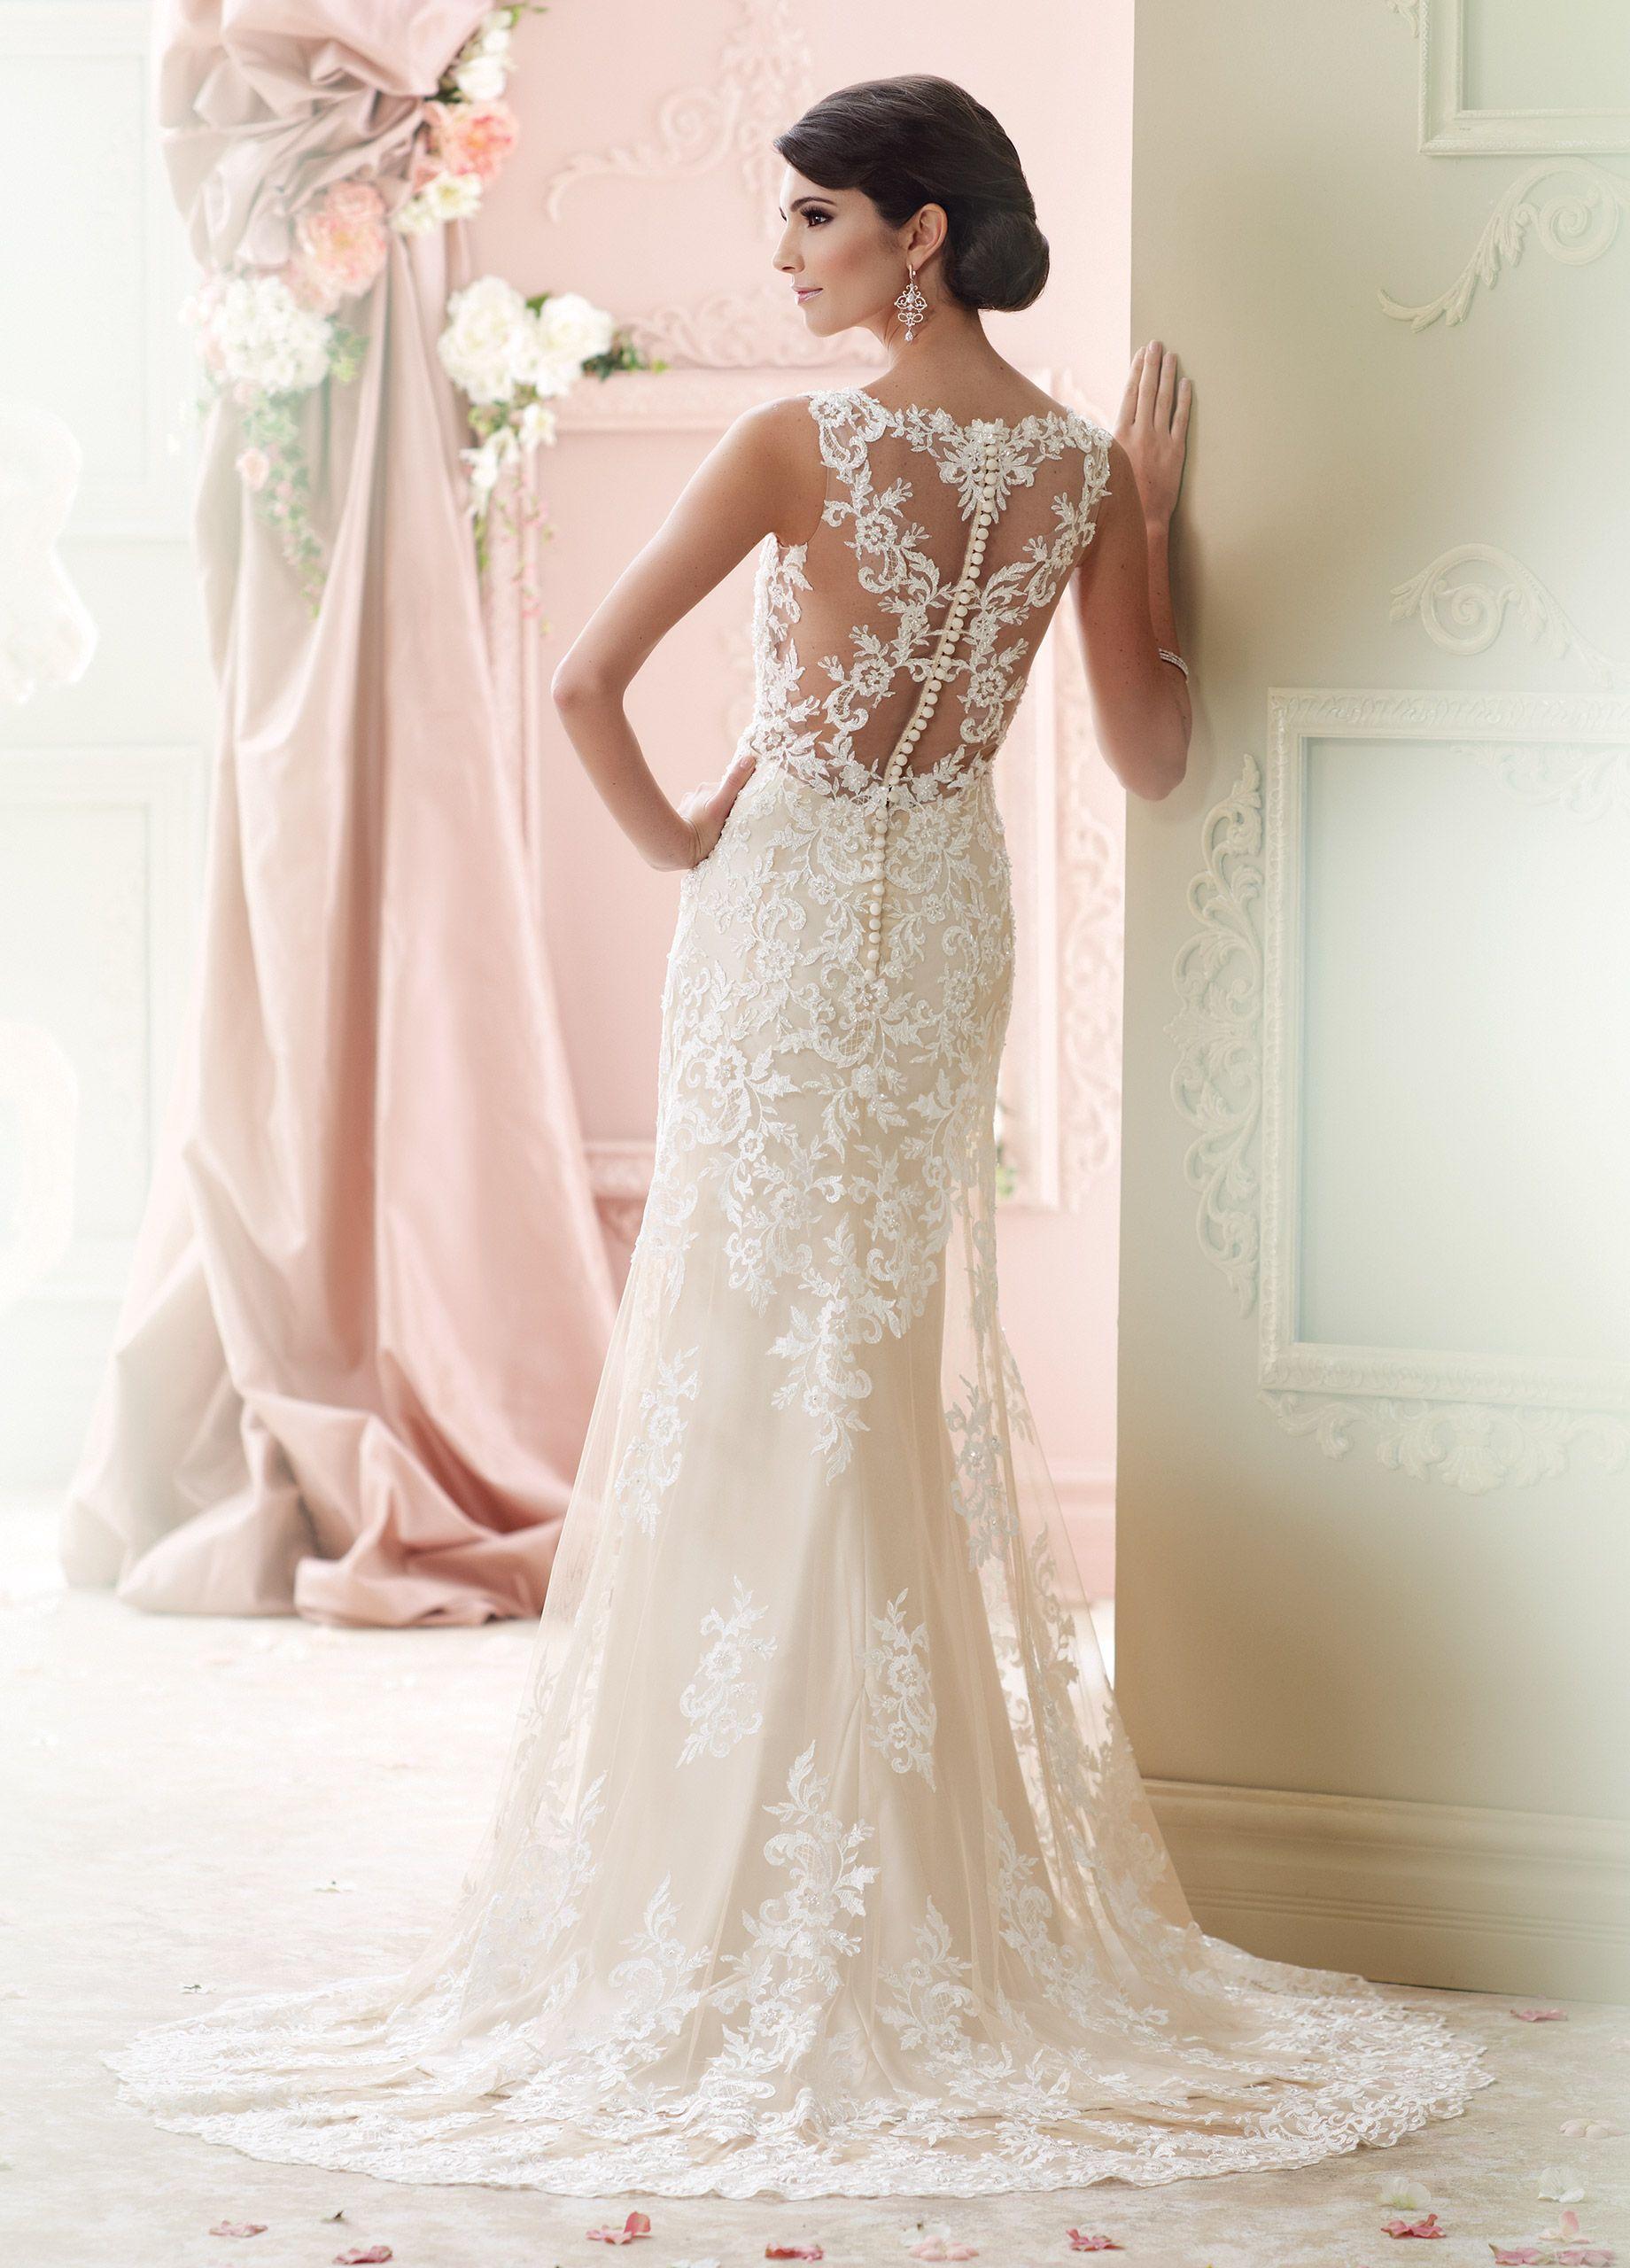 Vintage Lace Plunging Neckline A-Line Wedding Dress- 215278 Florine ...